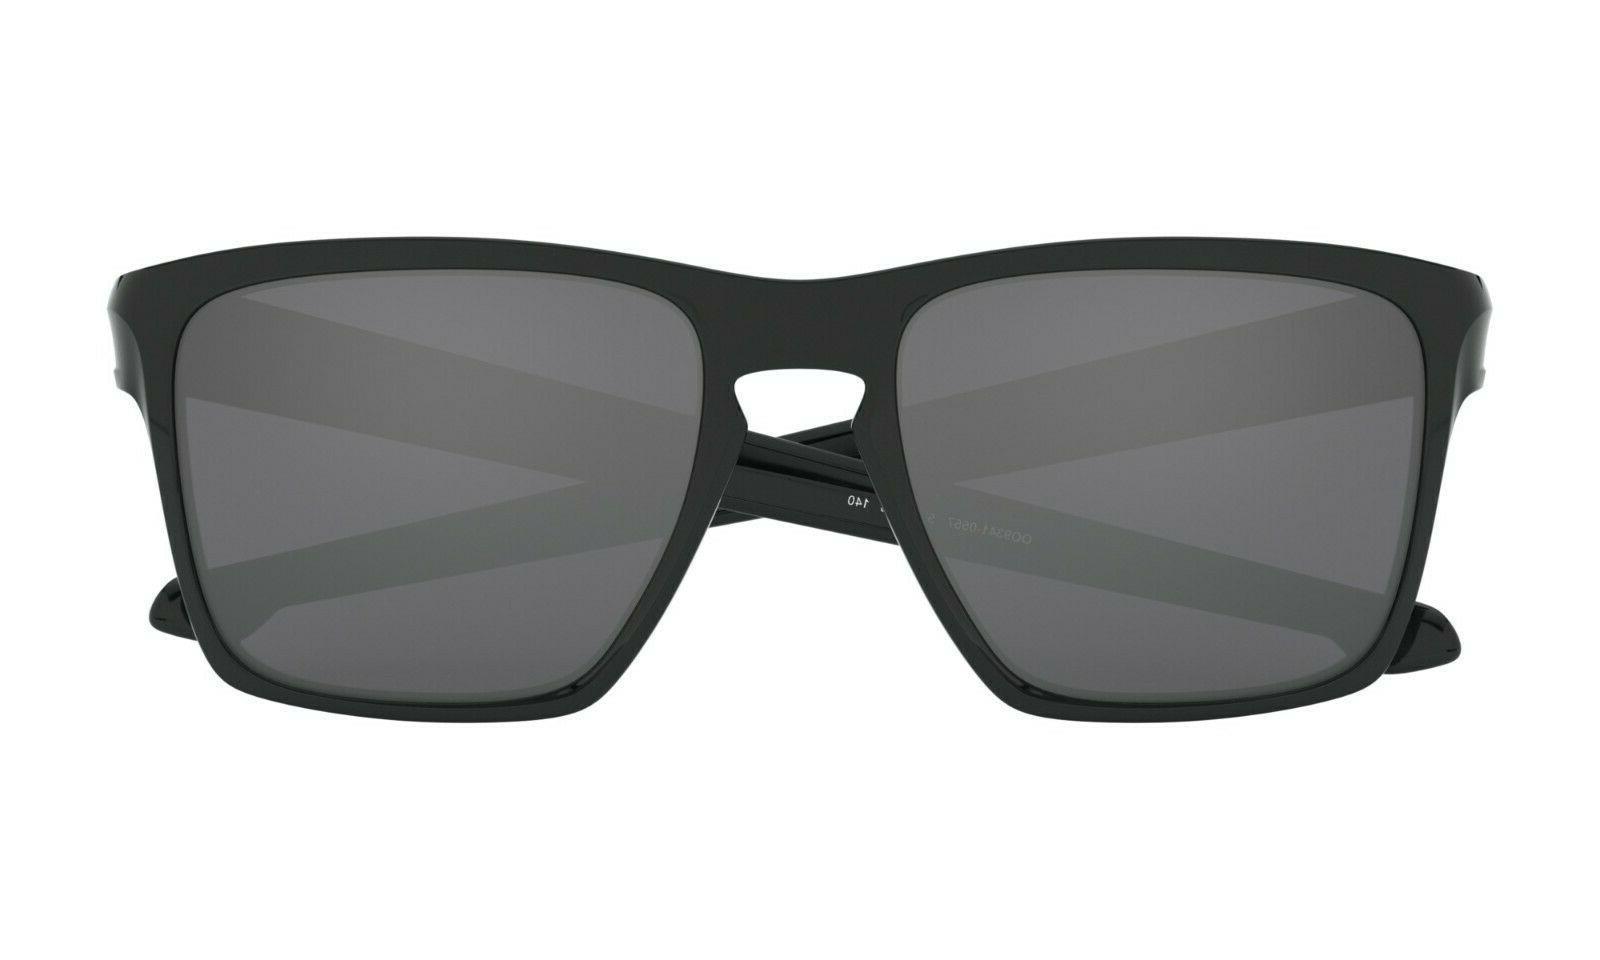 Oakley OO9341-05 Polished Black Frame W/ Black